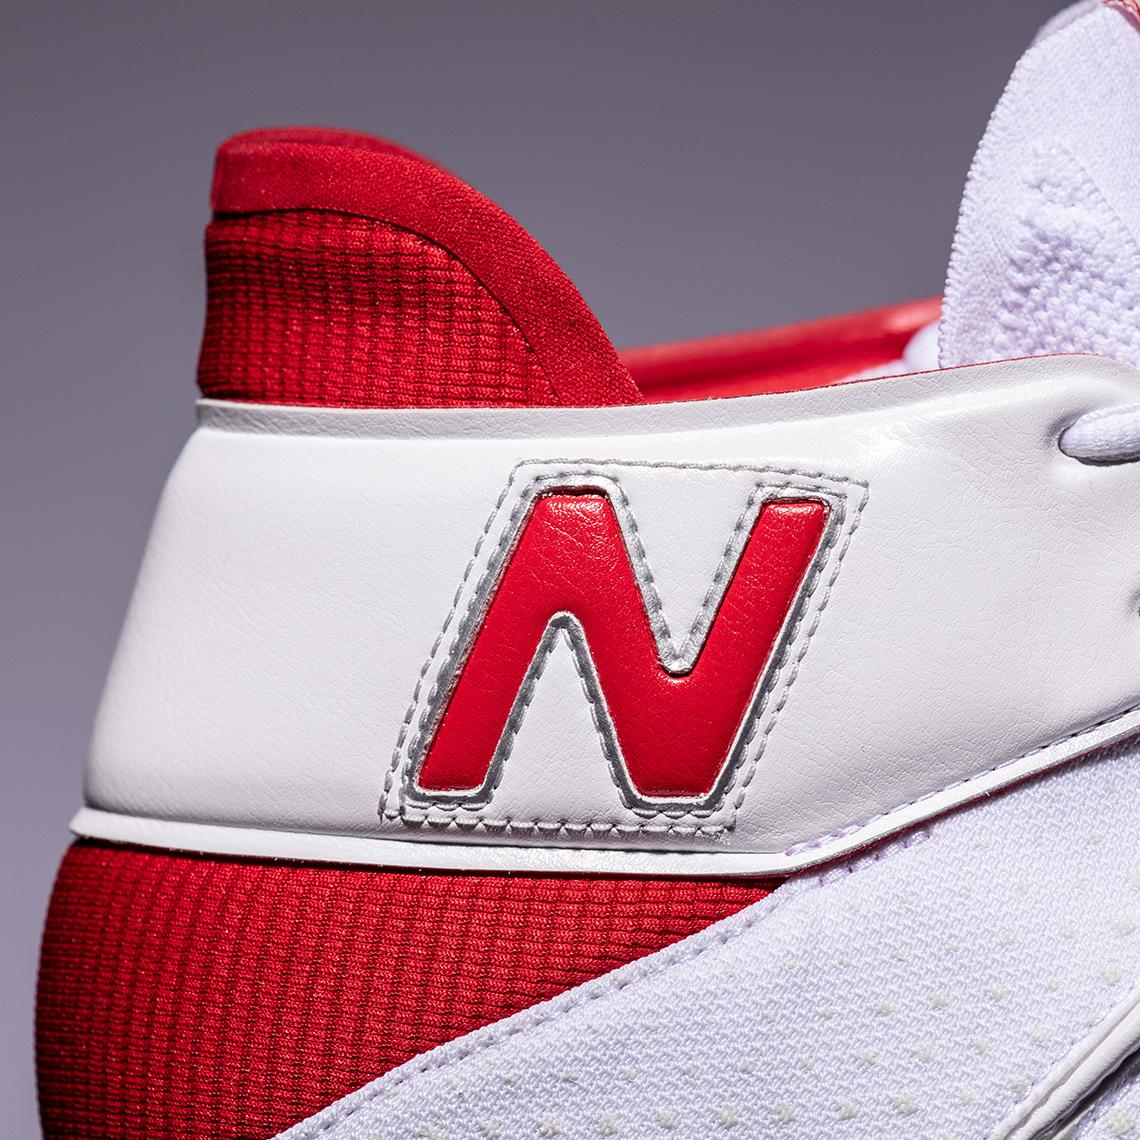 Kawhi Leonard New Balance Shoes - First